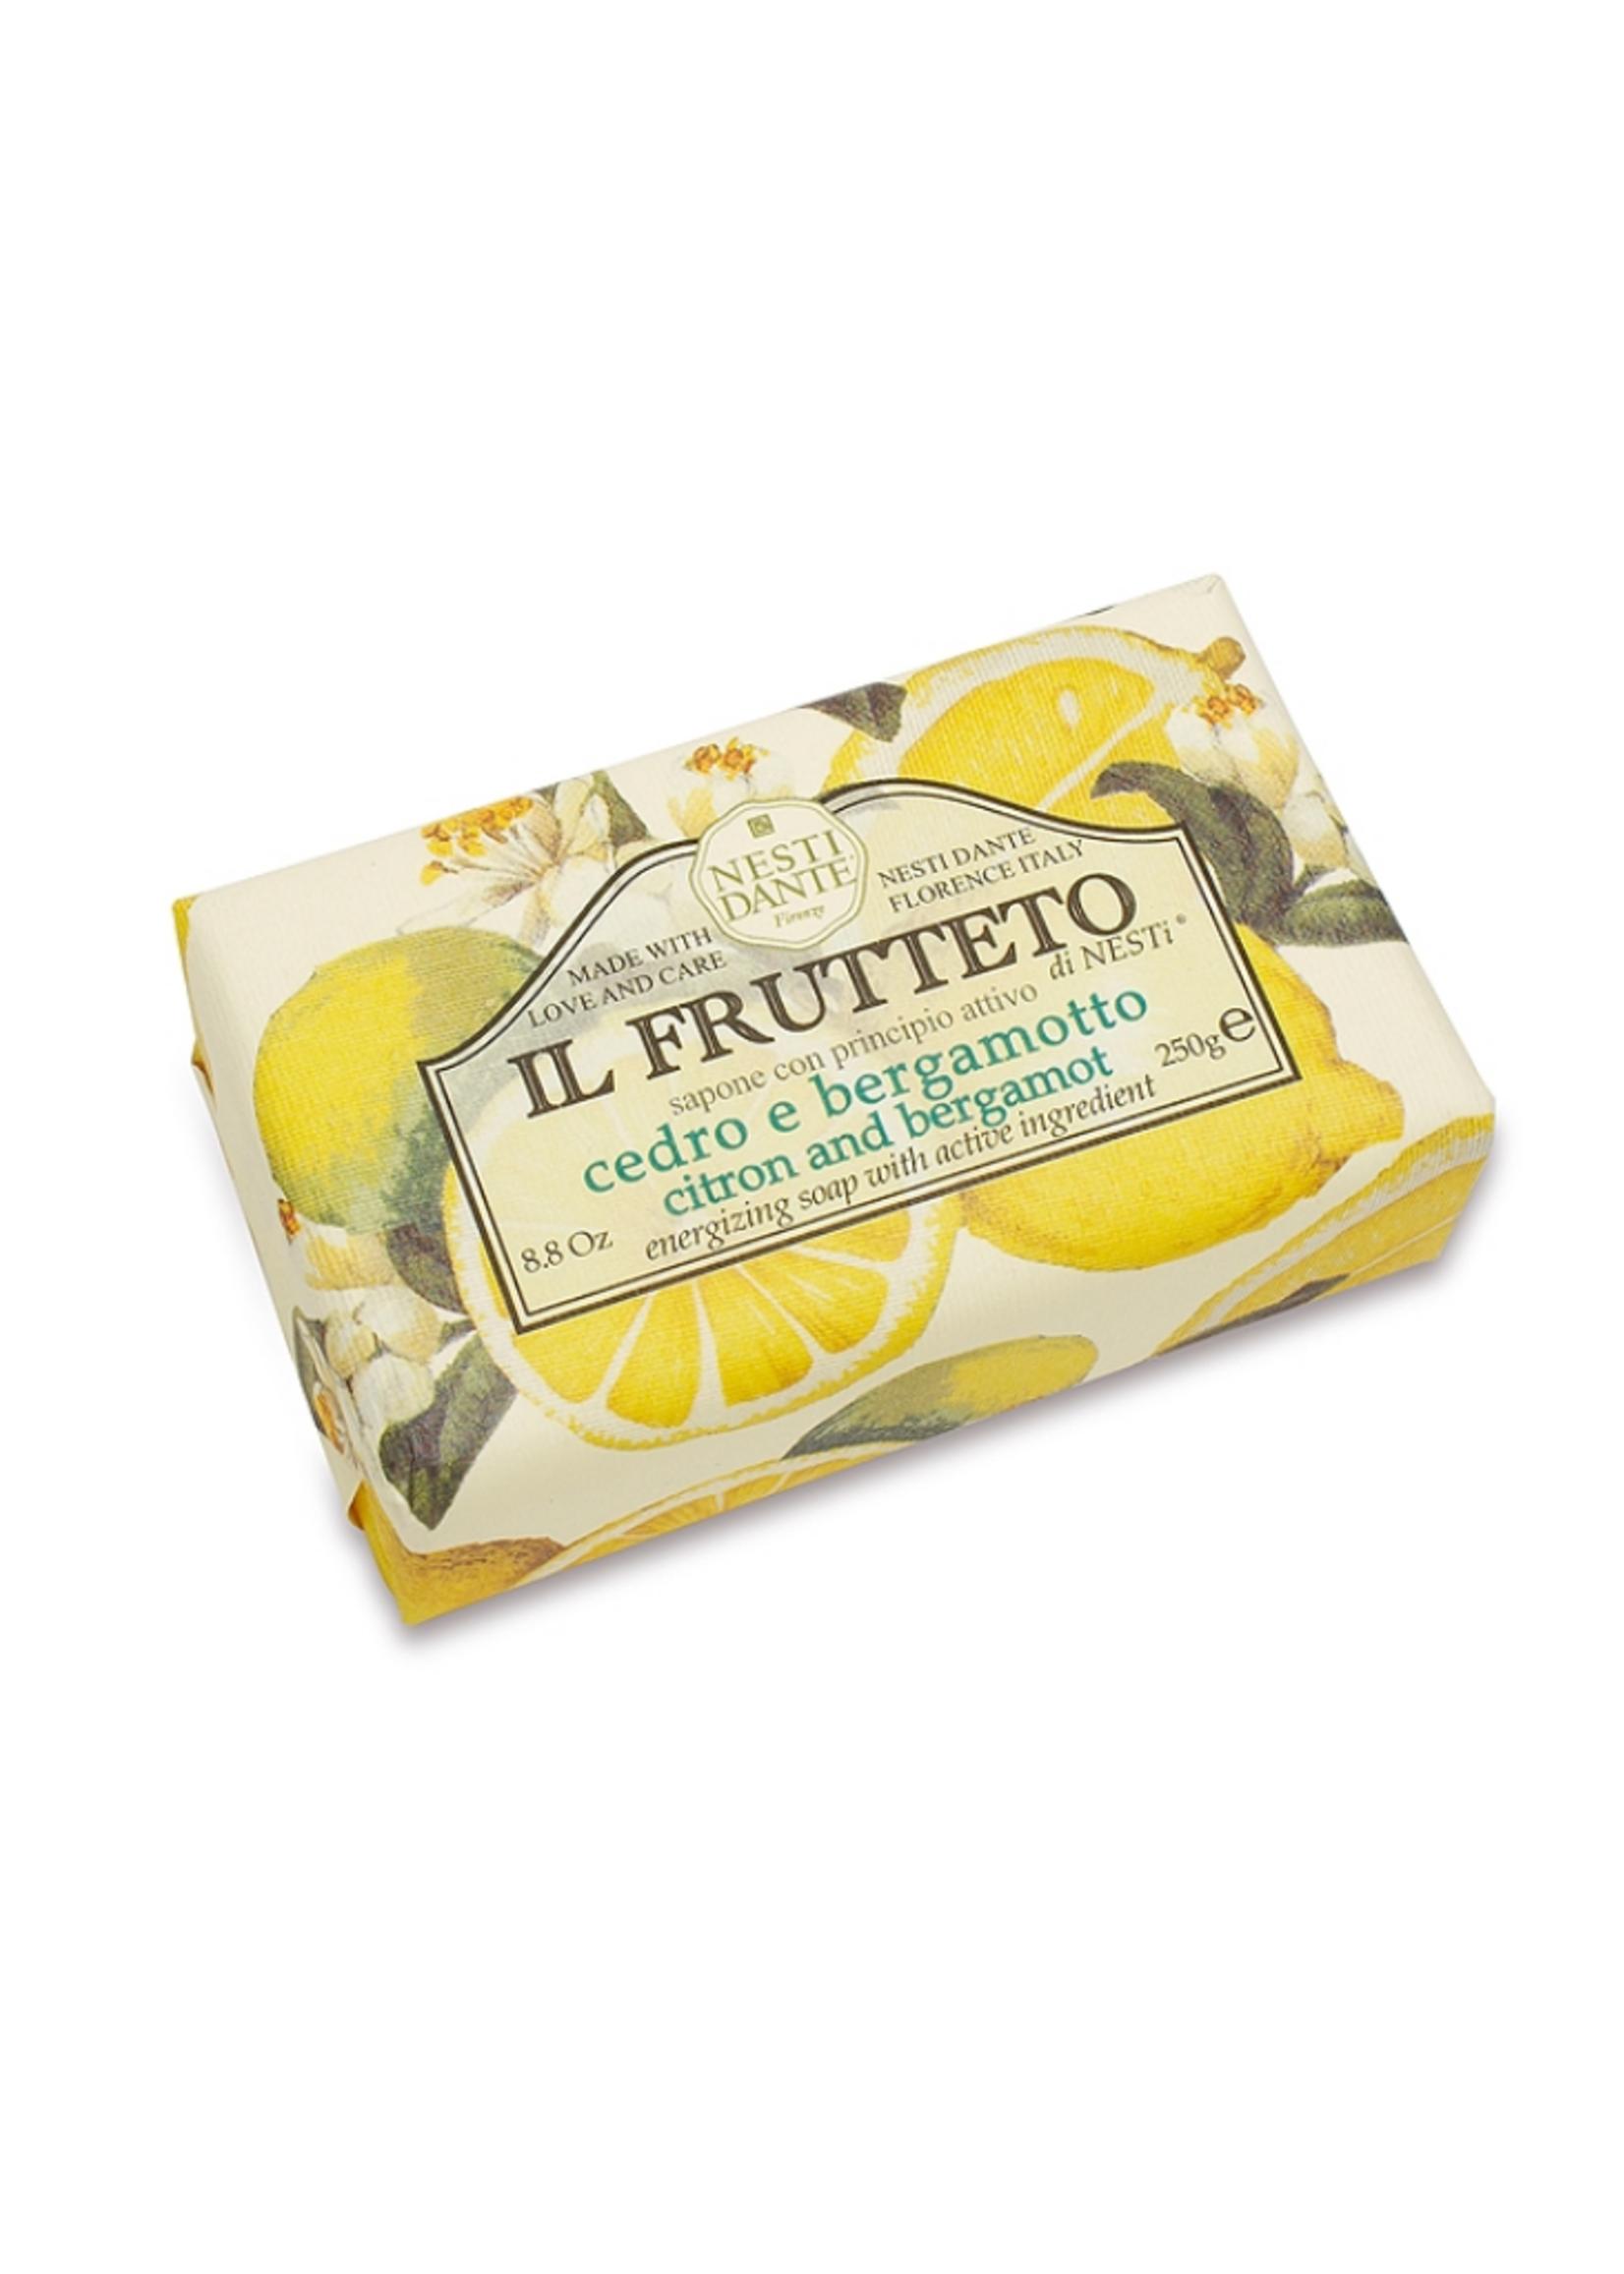 nesti dante Nesti Dante Italian Citron & Bergamont Soap